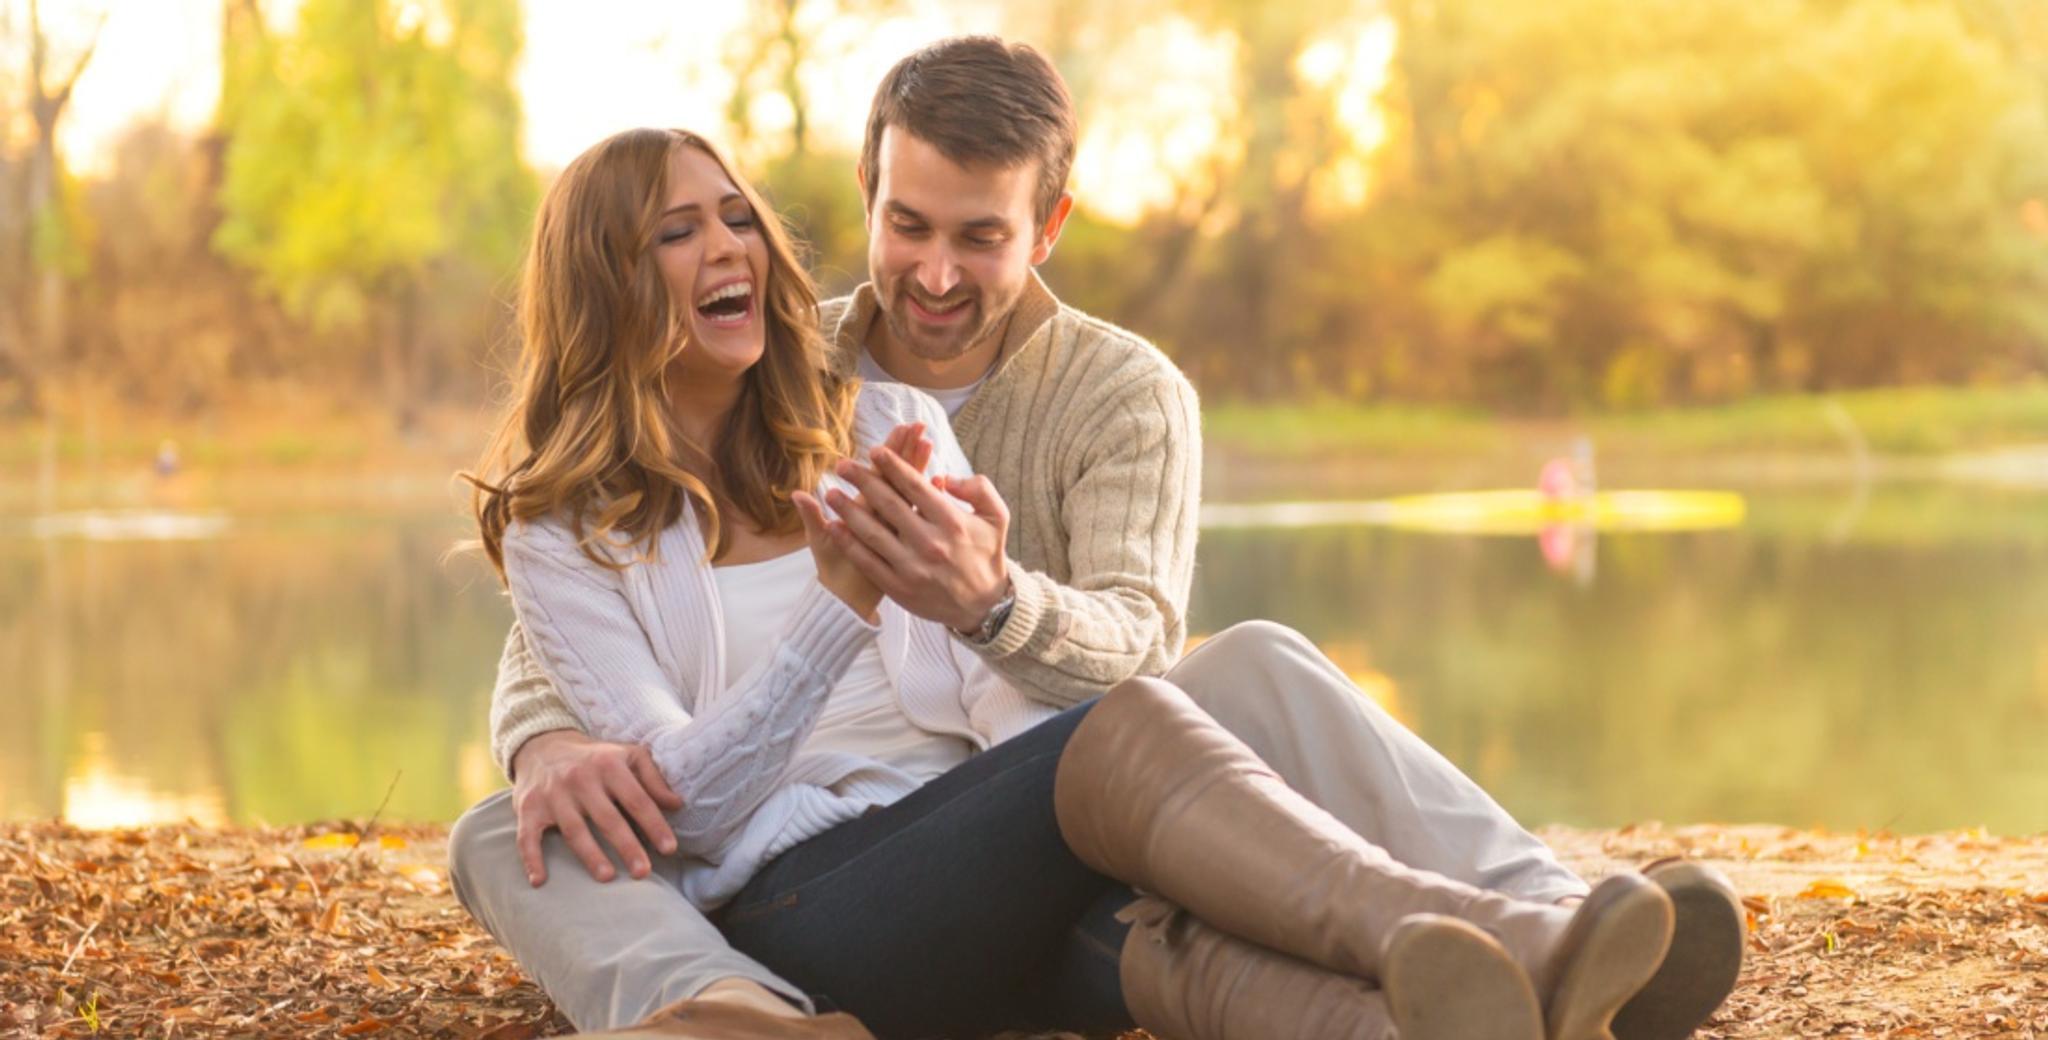 Paras dating site Australia arvostelua